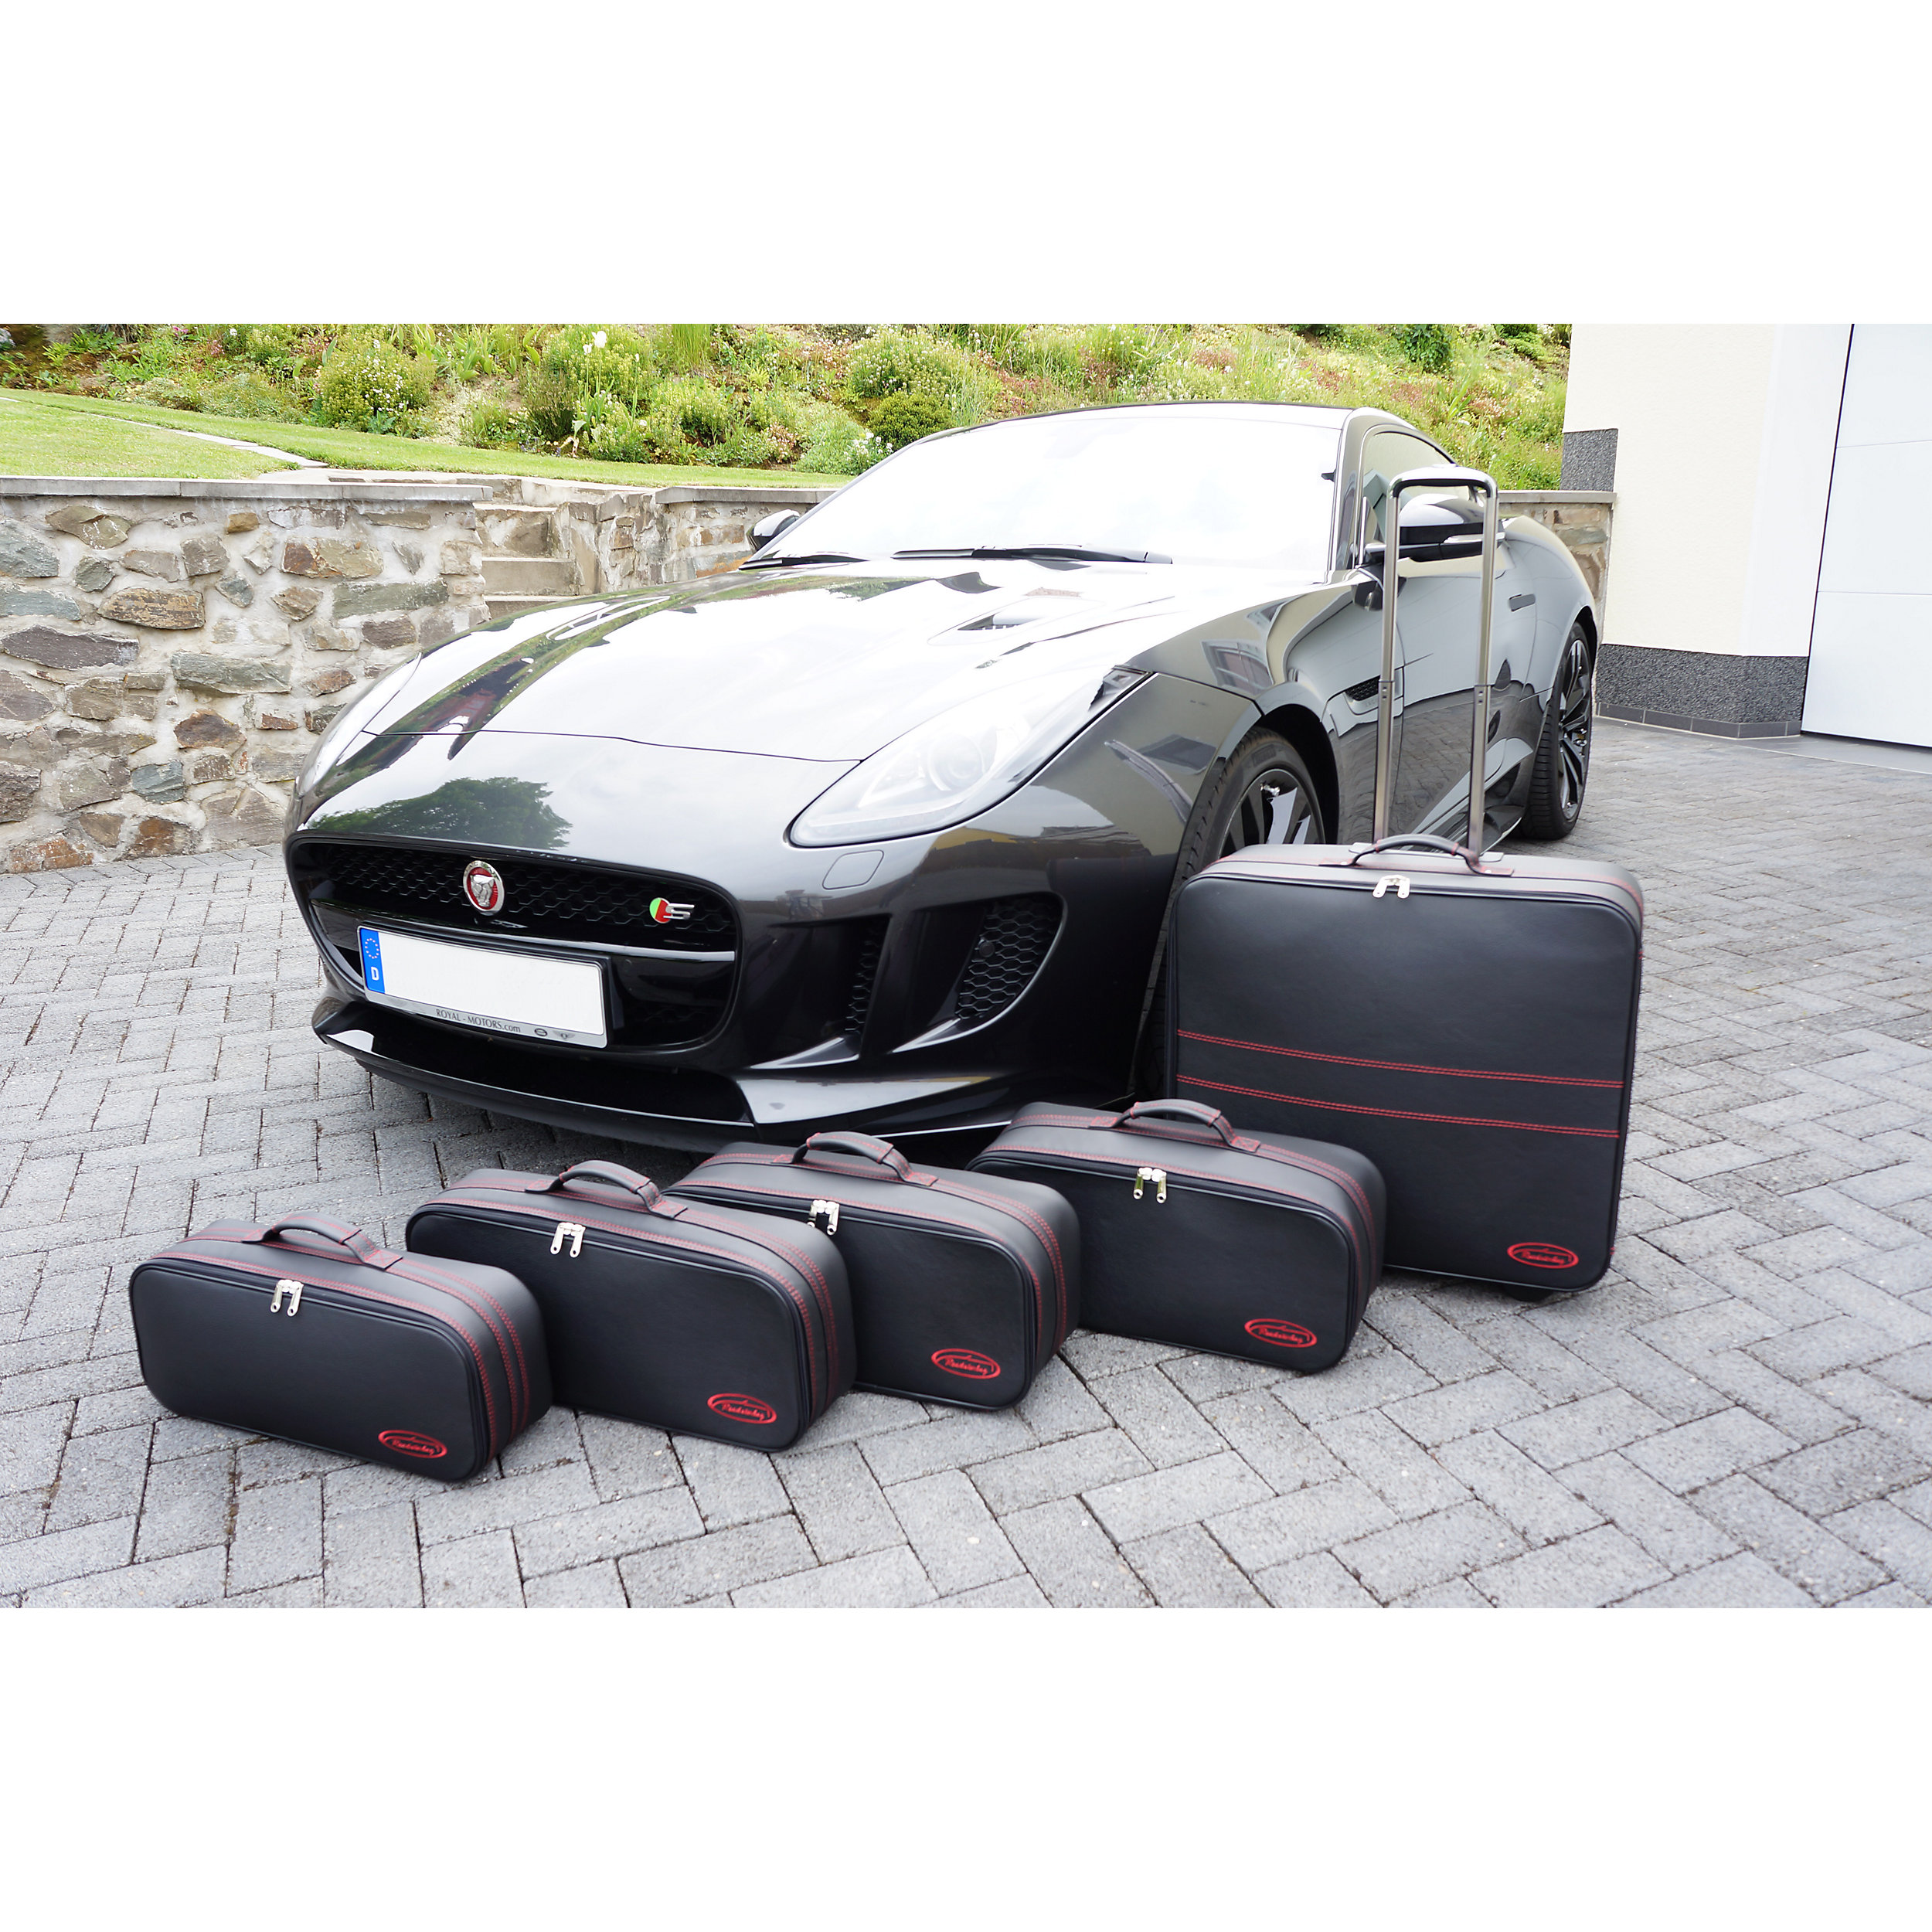 5-tlg. Kofferset mit 2 Rollen Jaguar F-Type Coupé XXL